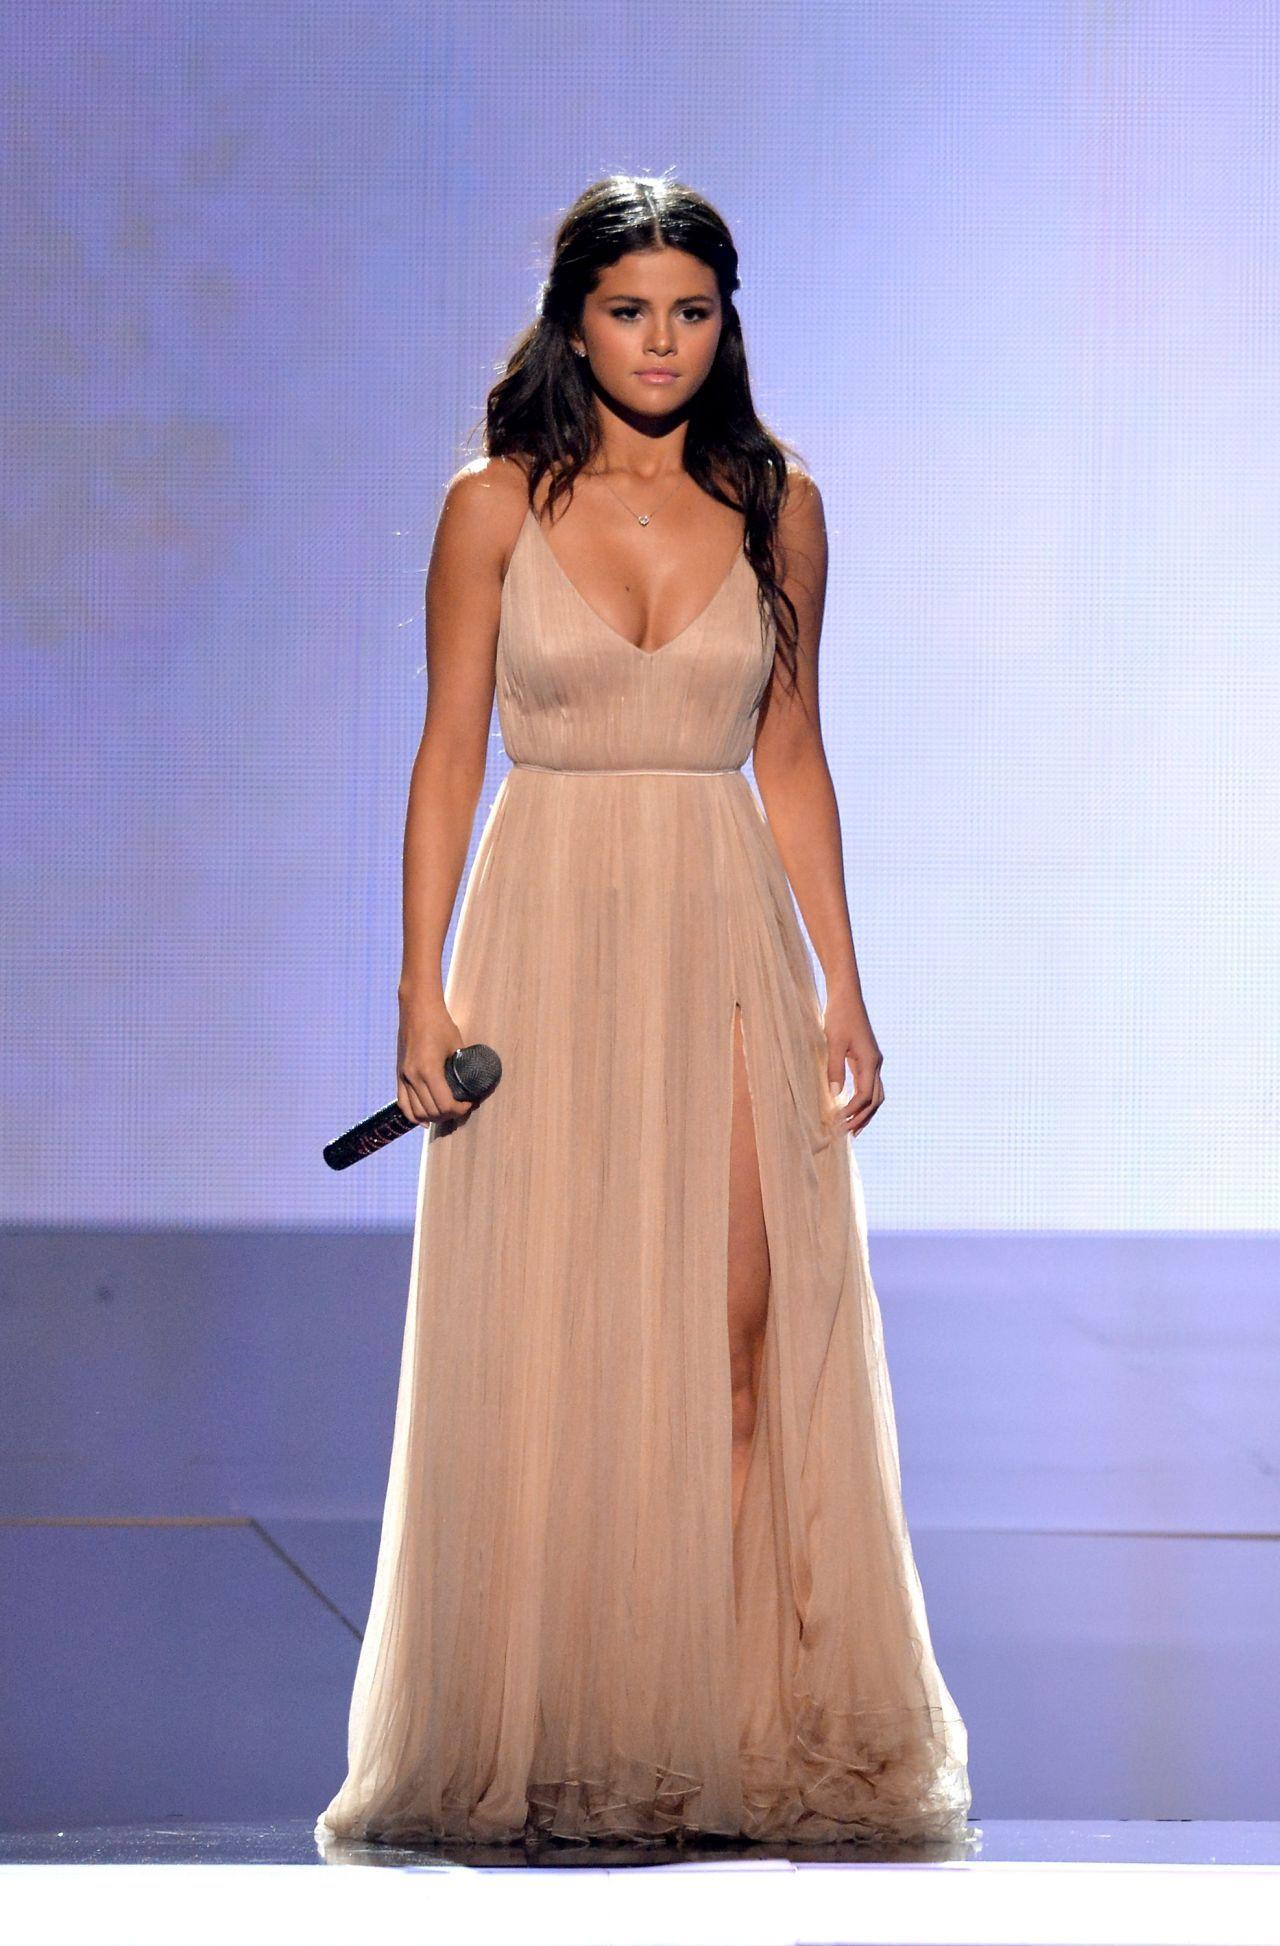 Selena gomez champagne evening prom dress american music awards